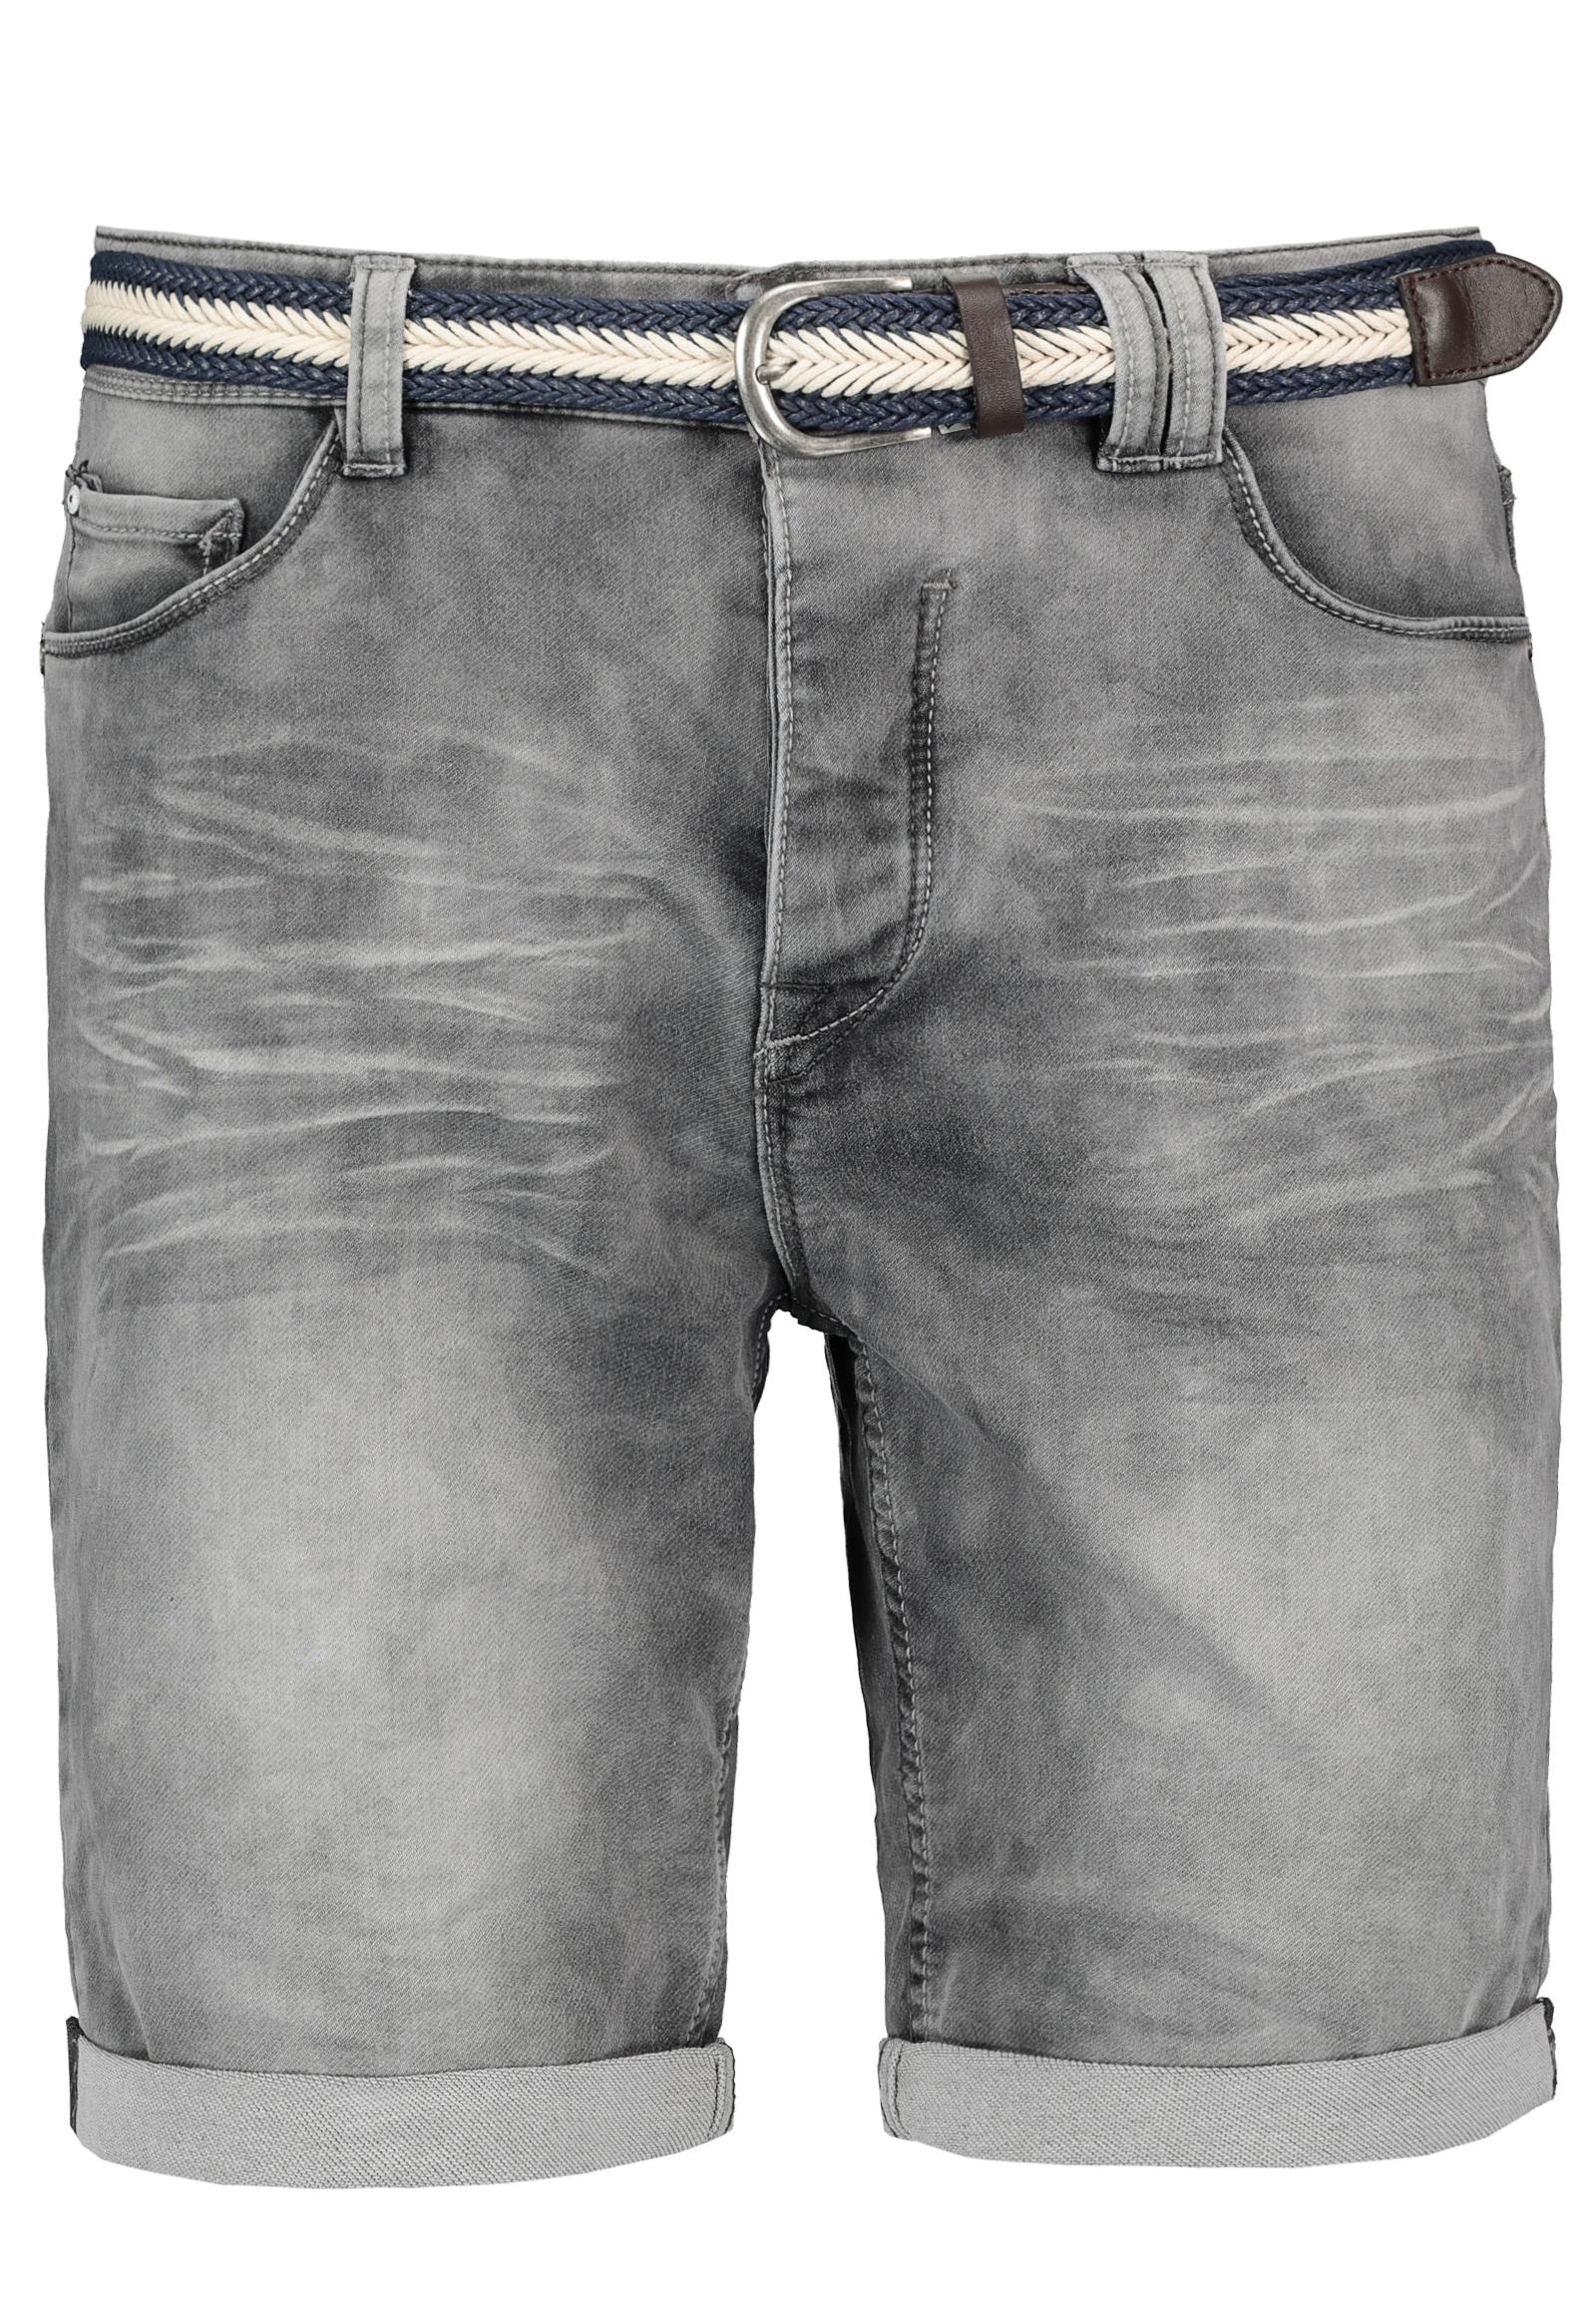 SUBLEVEL Jeansbermudas | Bekleidung > Shorts & Bermudas > Jeans Bermudas | Grau | Sublevel